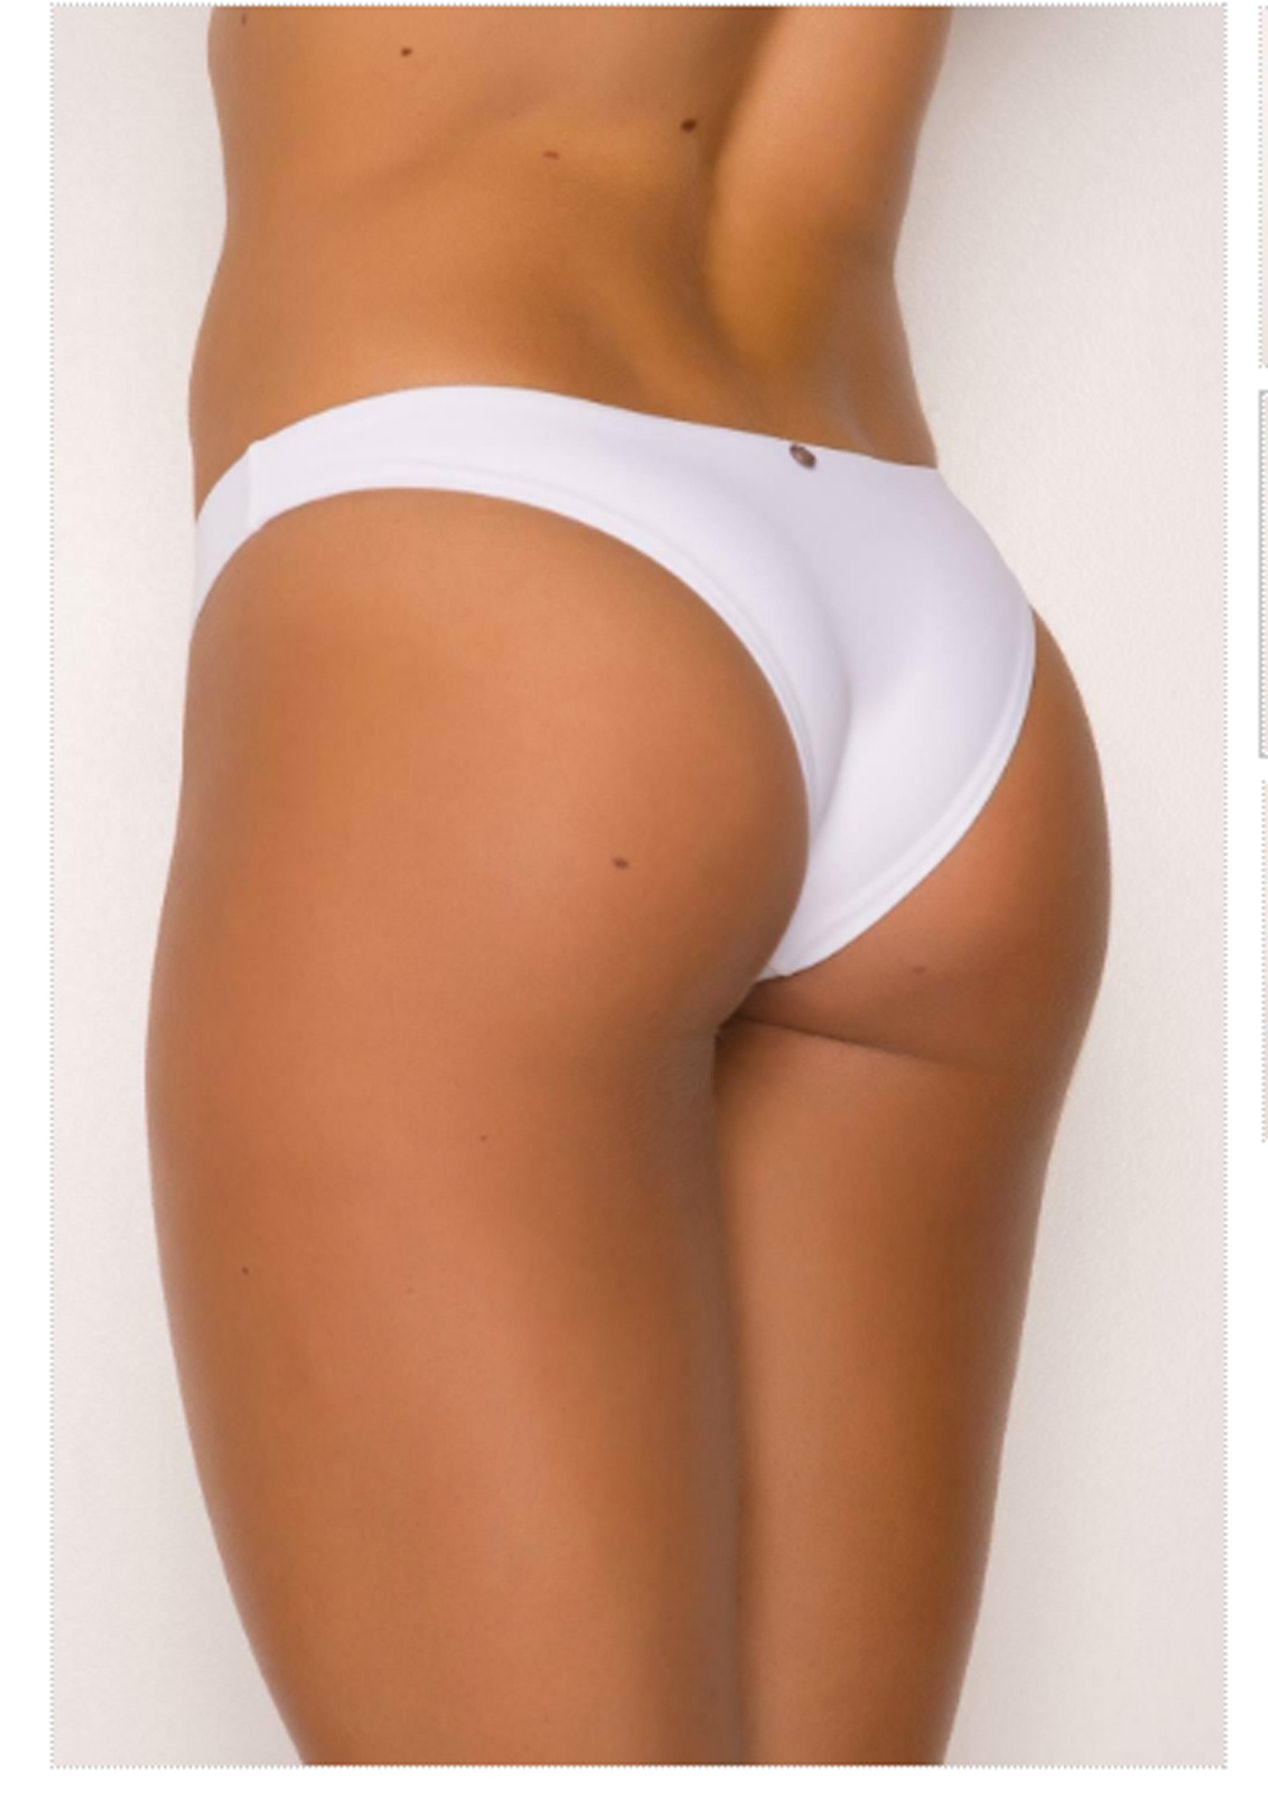 bde6b53b10d96 Sheridyn Swim - High Cut Bottoms White - Sheridyn Swimwear - Onceit